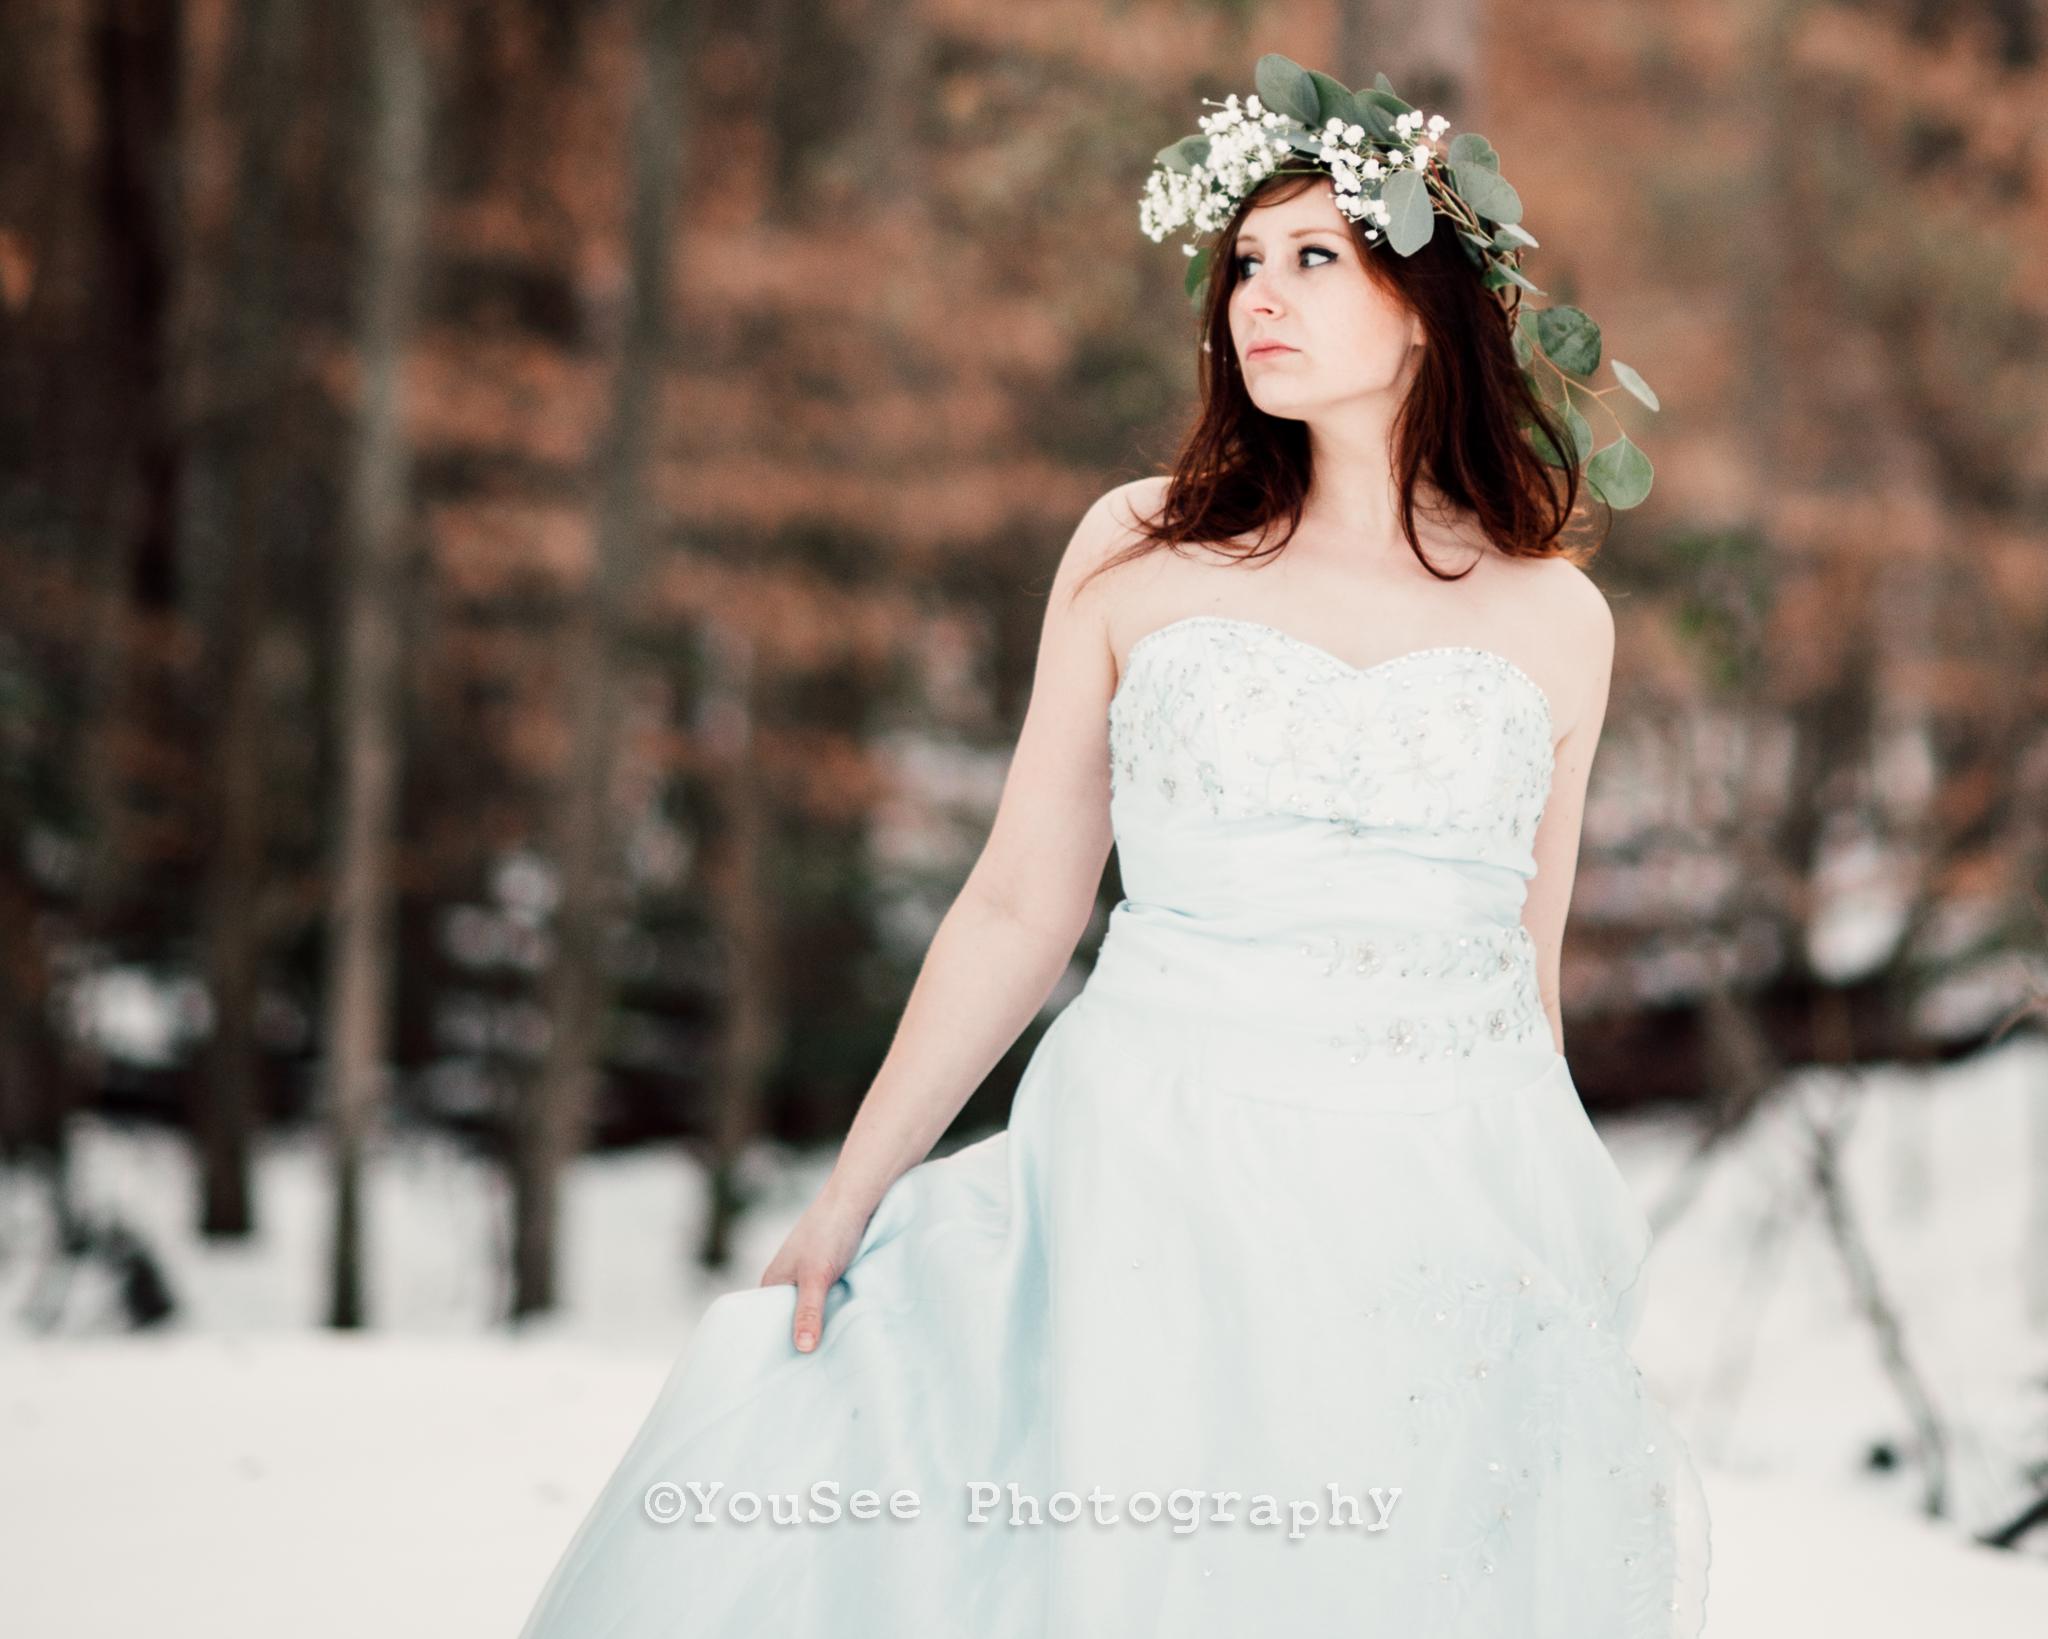 seniorportrait_fredericksburg_photography_winter2 (27)